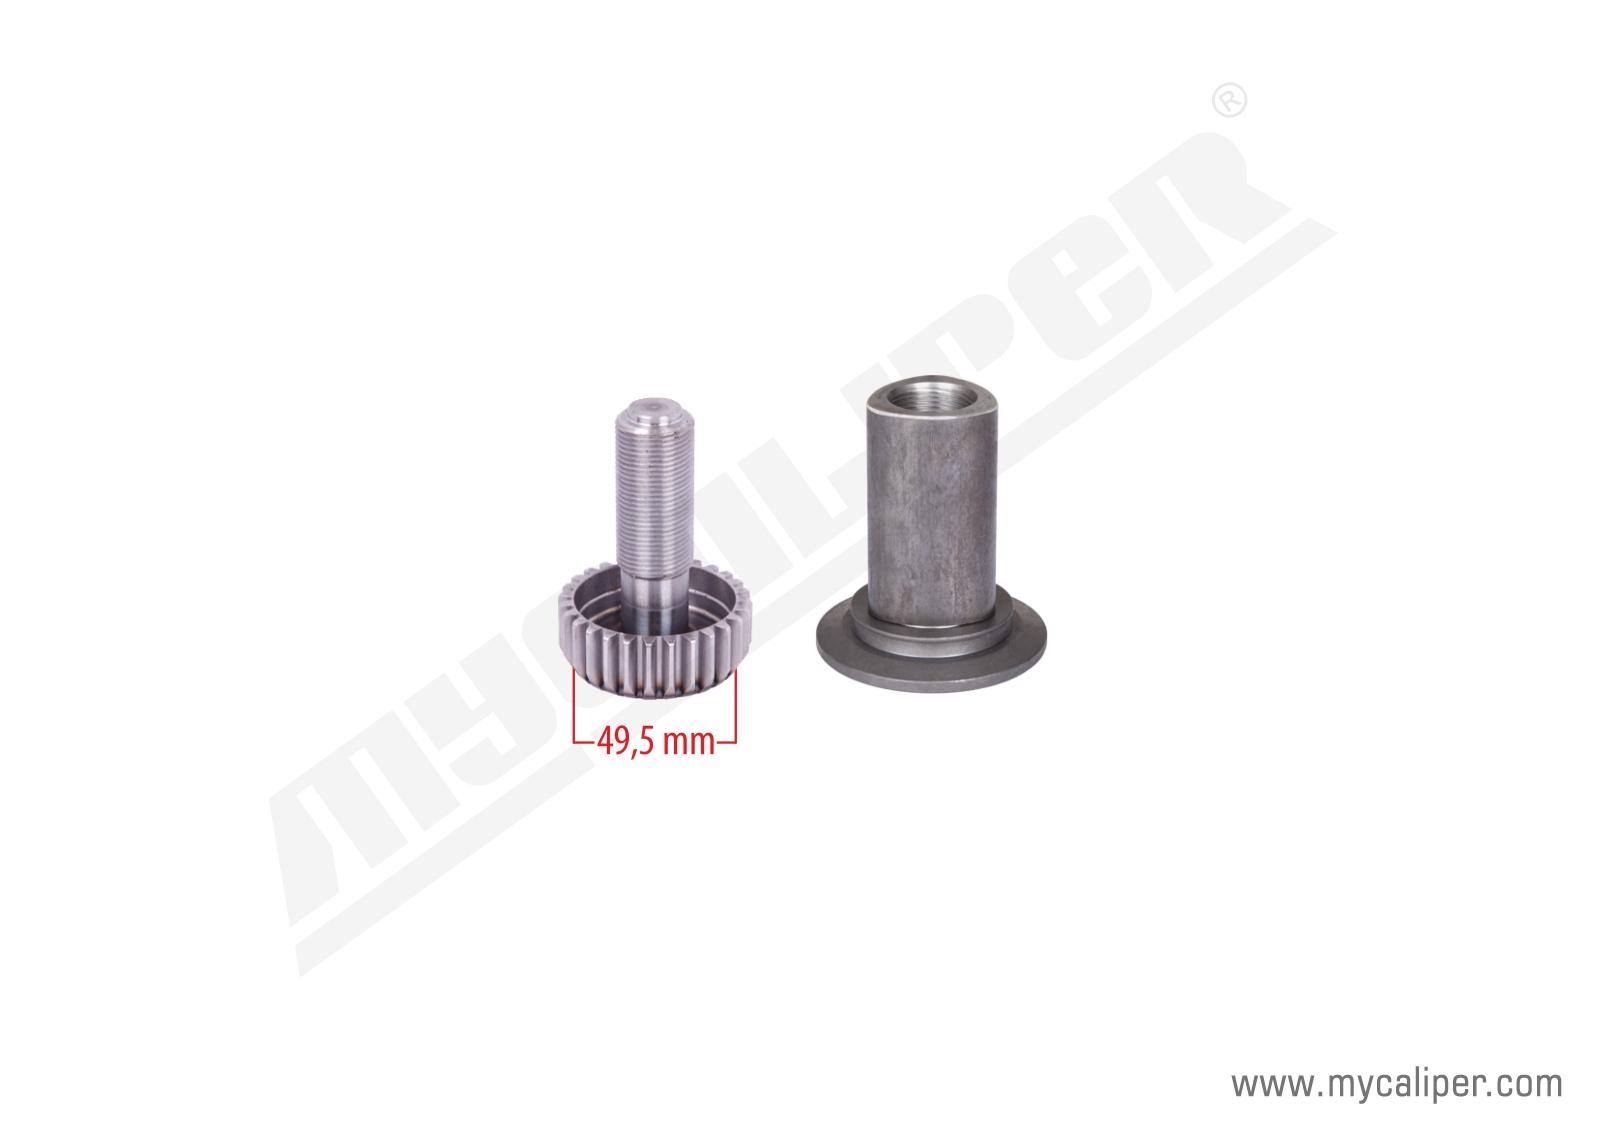 Caliper Calibration Gear